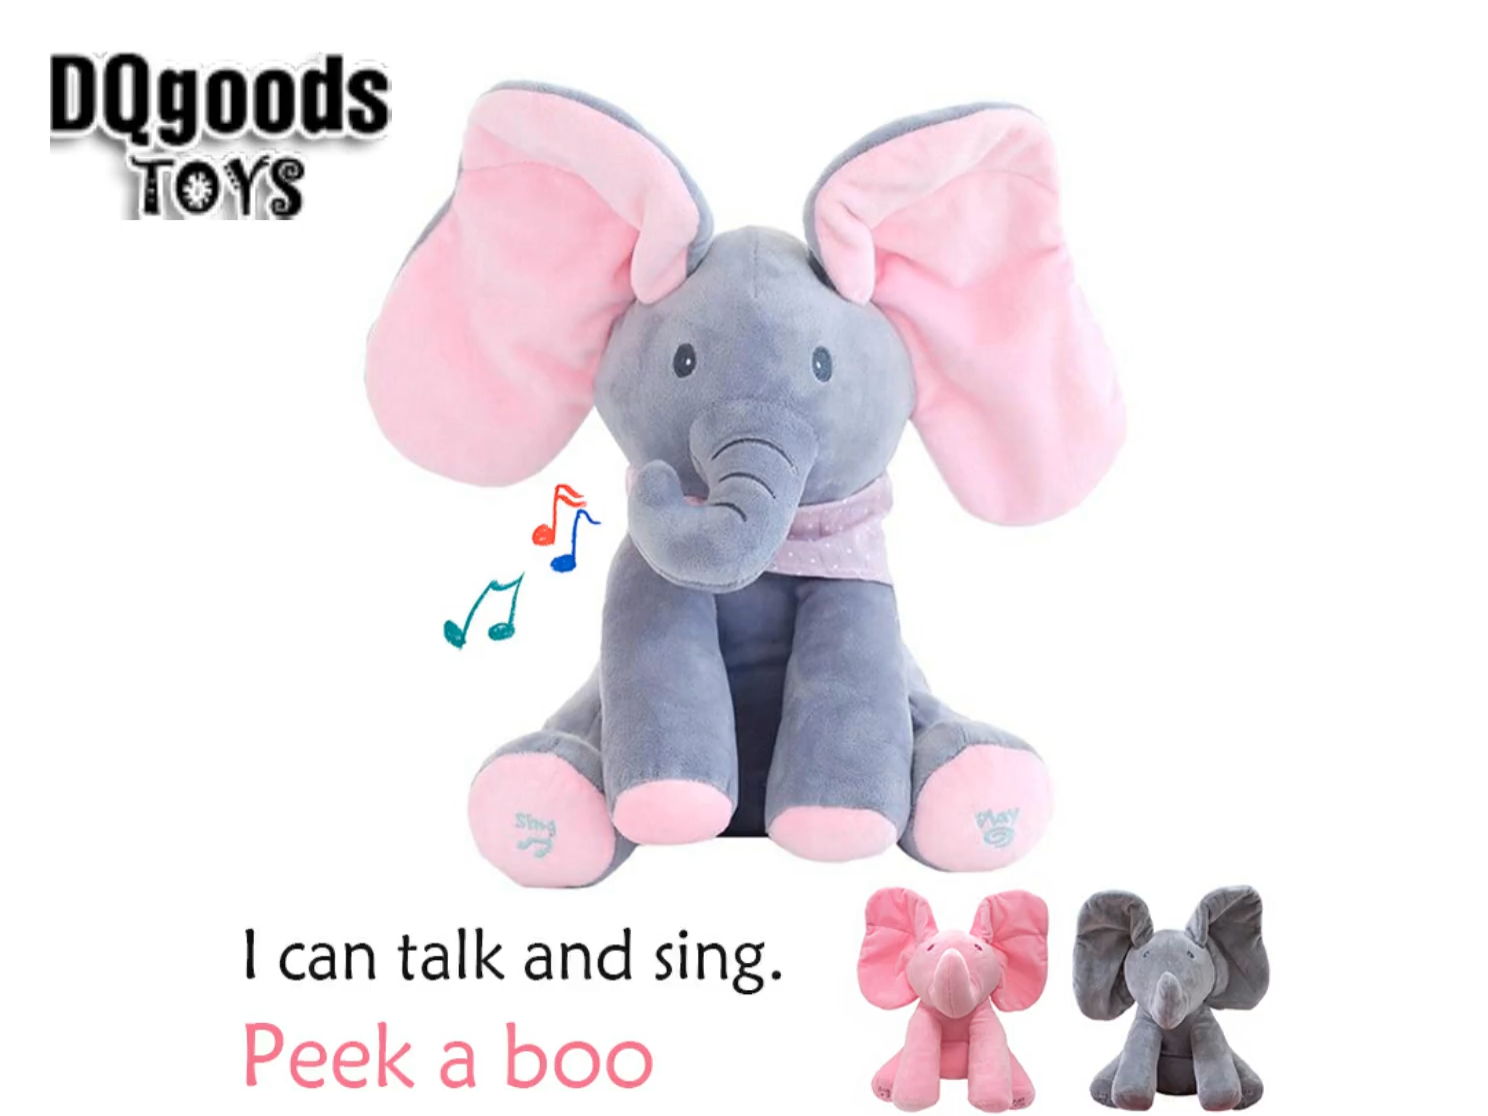 Peek-A-BOO Talking Singing Elephant Music Doll Plush Toy Stuffed Kids Toys Gifts